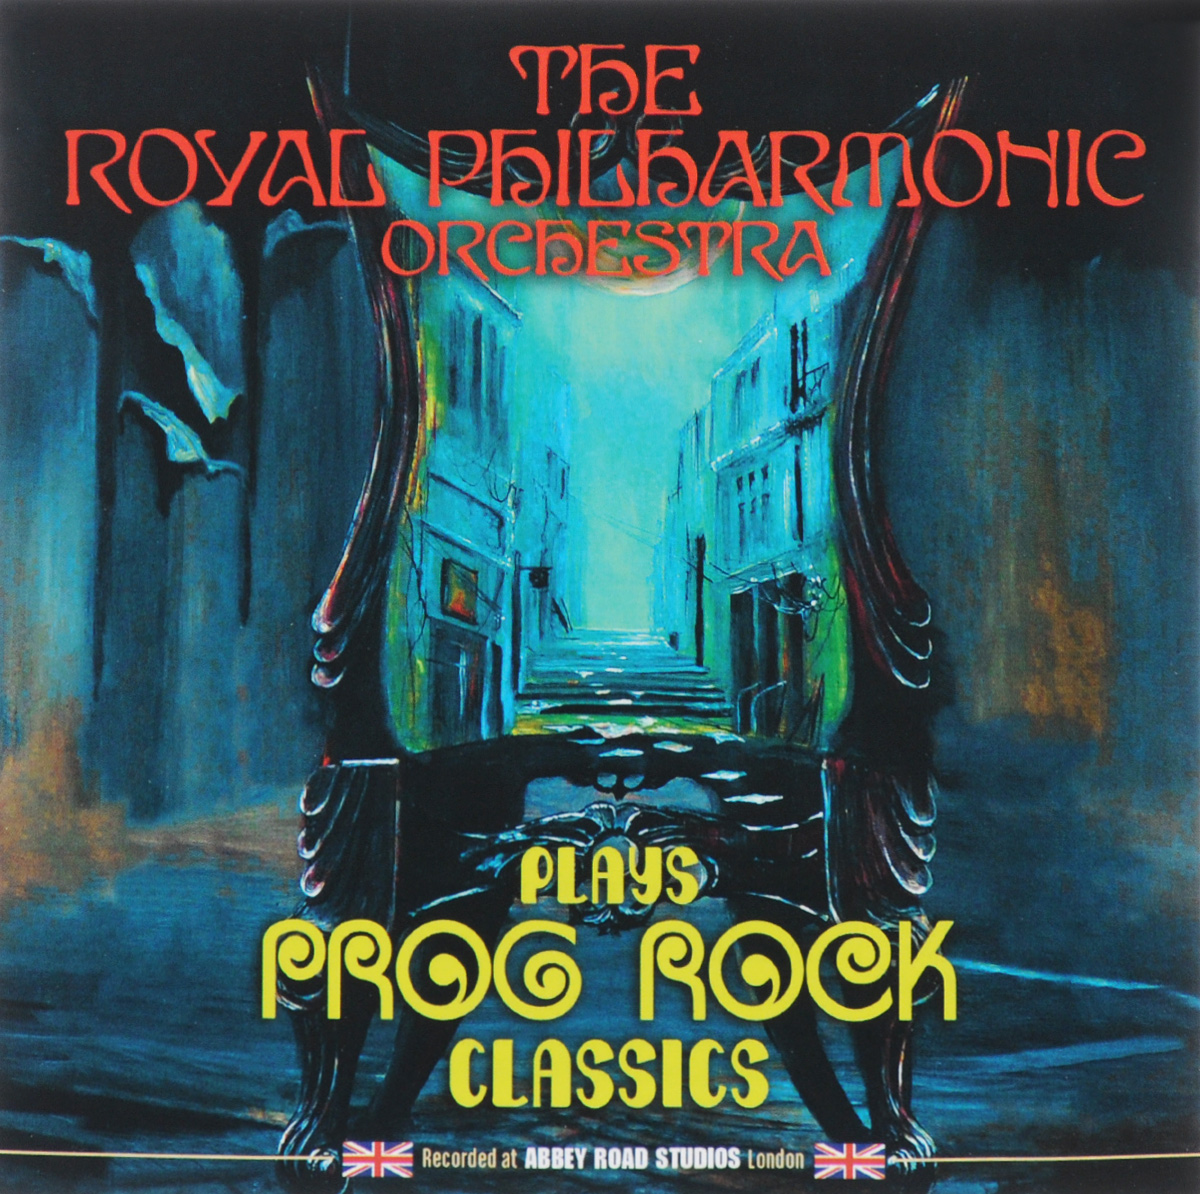 The Royal Philharmonic Orchestra Plays Prog Rock Classics. The Royal Philharmonic Orchestra,Ричард Харви,Тейс Ван Лиер,Патрик Мораз,Джимми Гринспун,Марк Фелтем